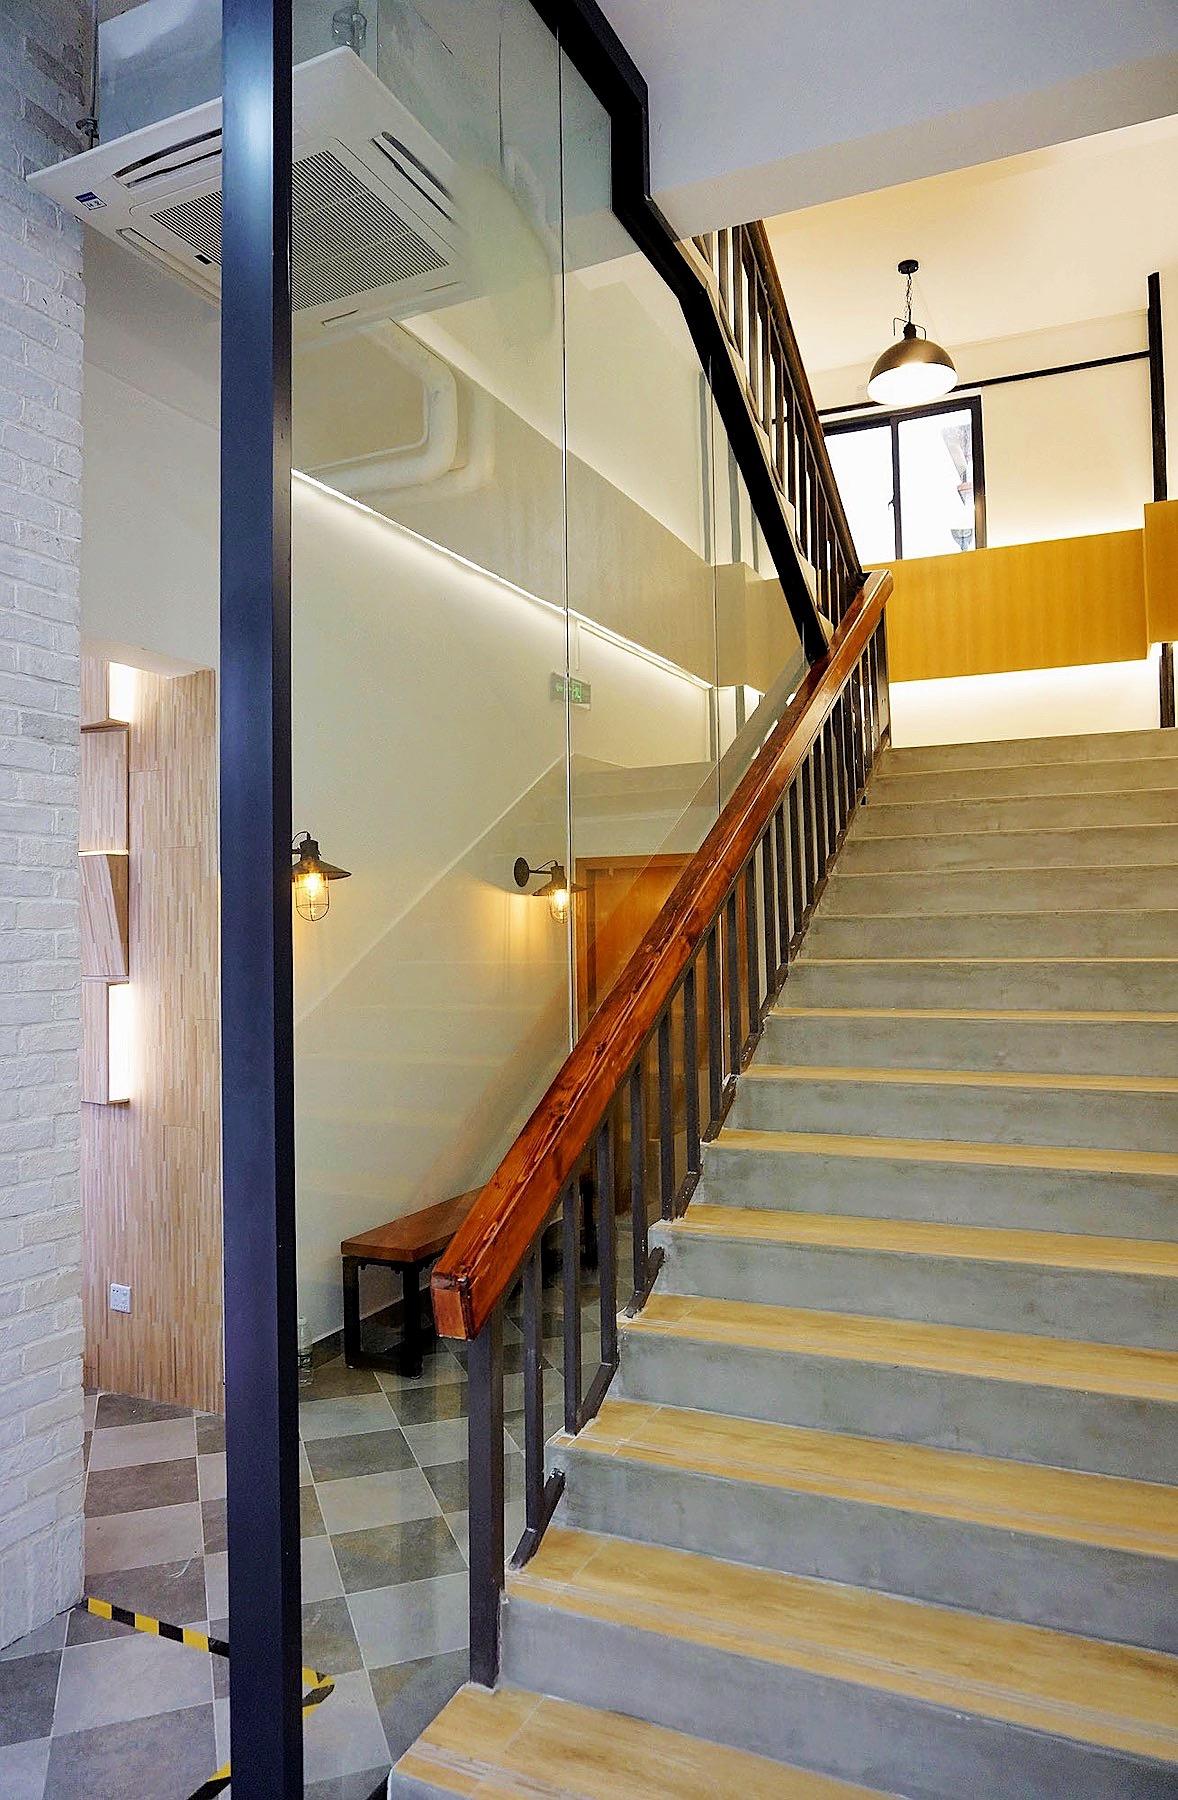 Grandway Office Renovation 2018 2nd Floor Boss Room Corridor 010